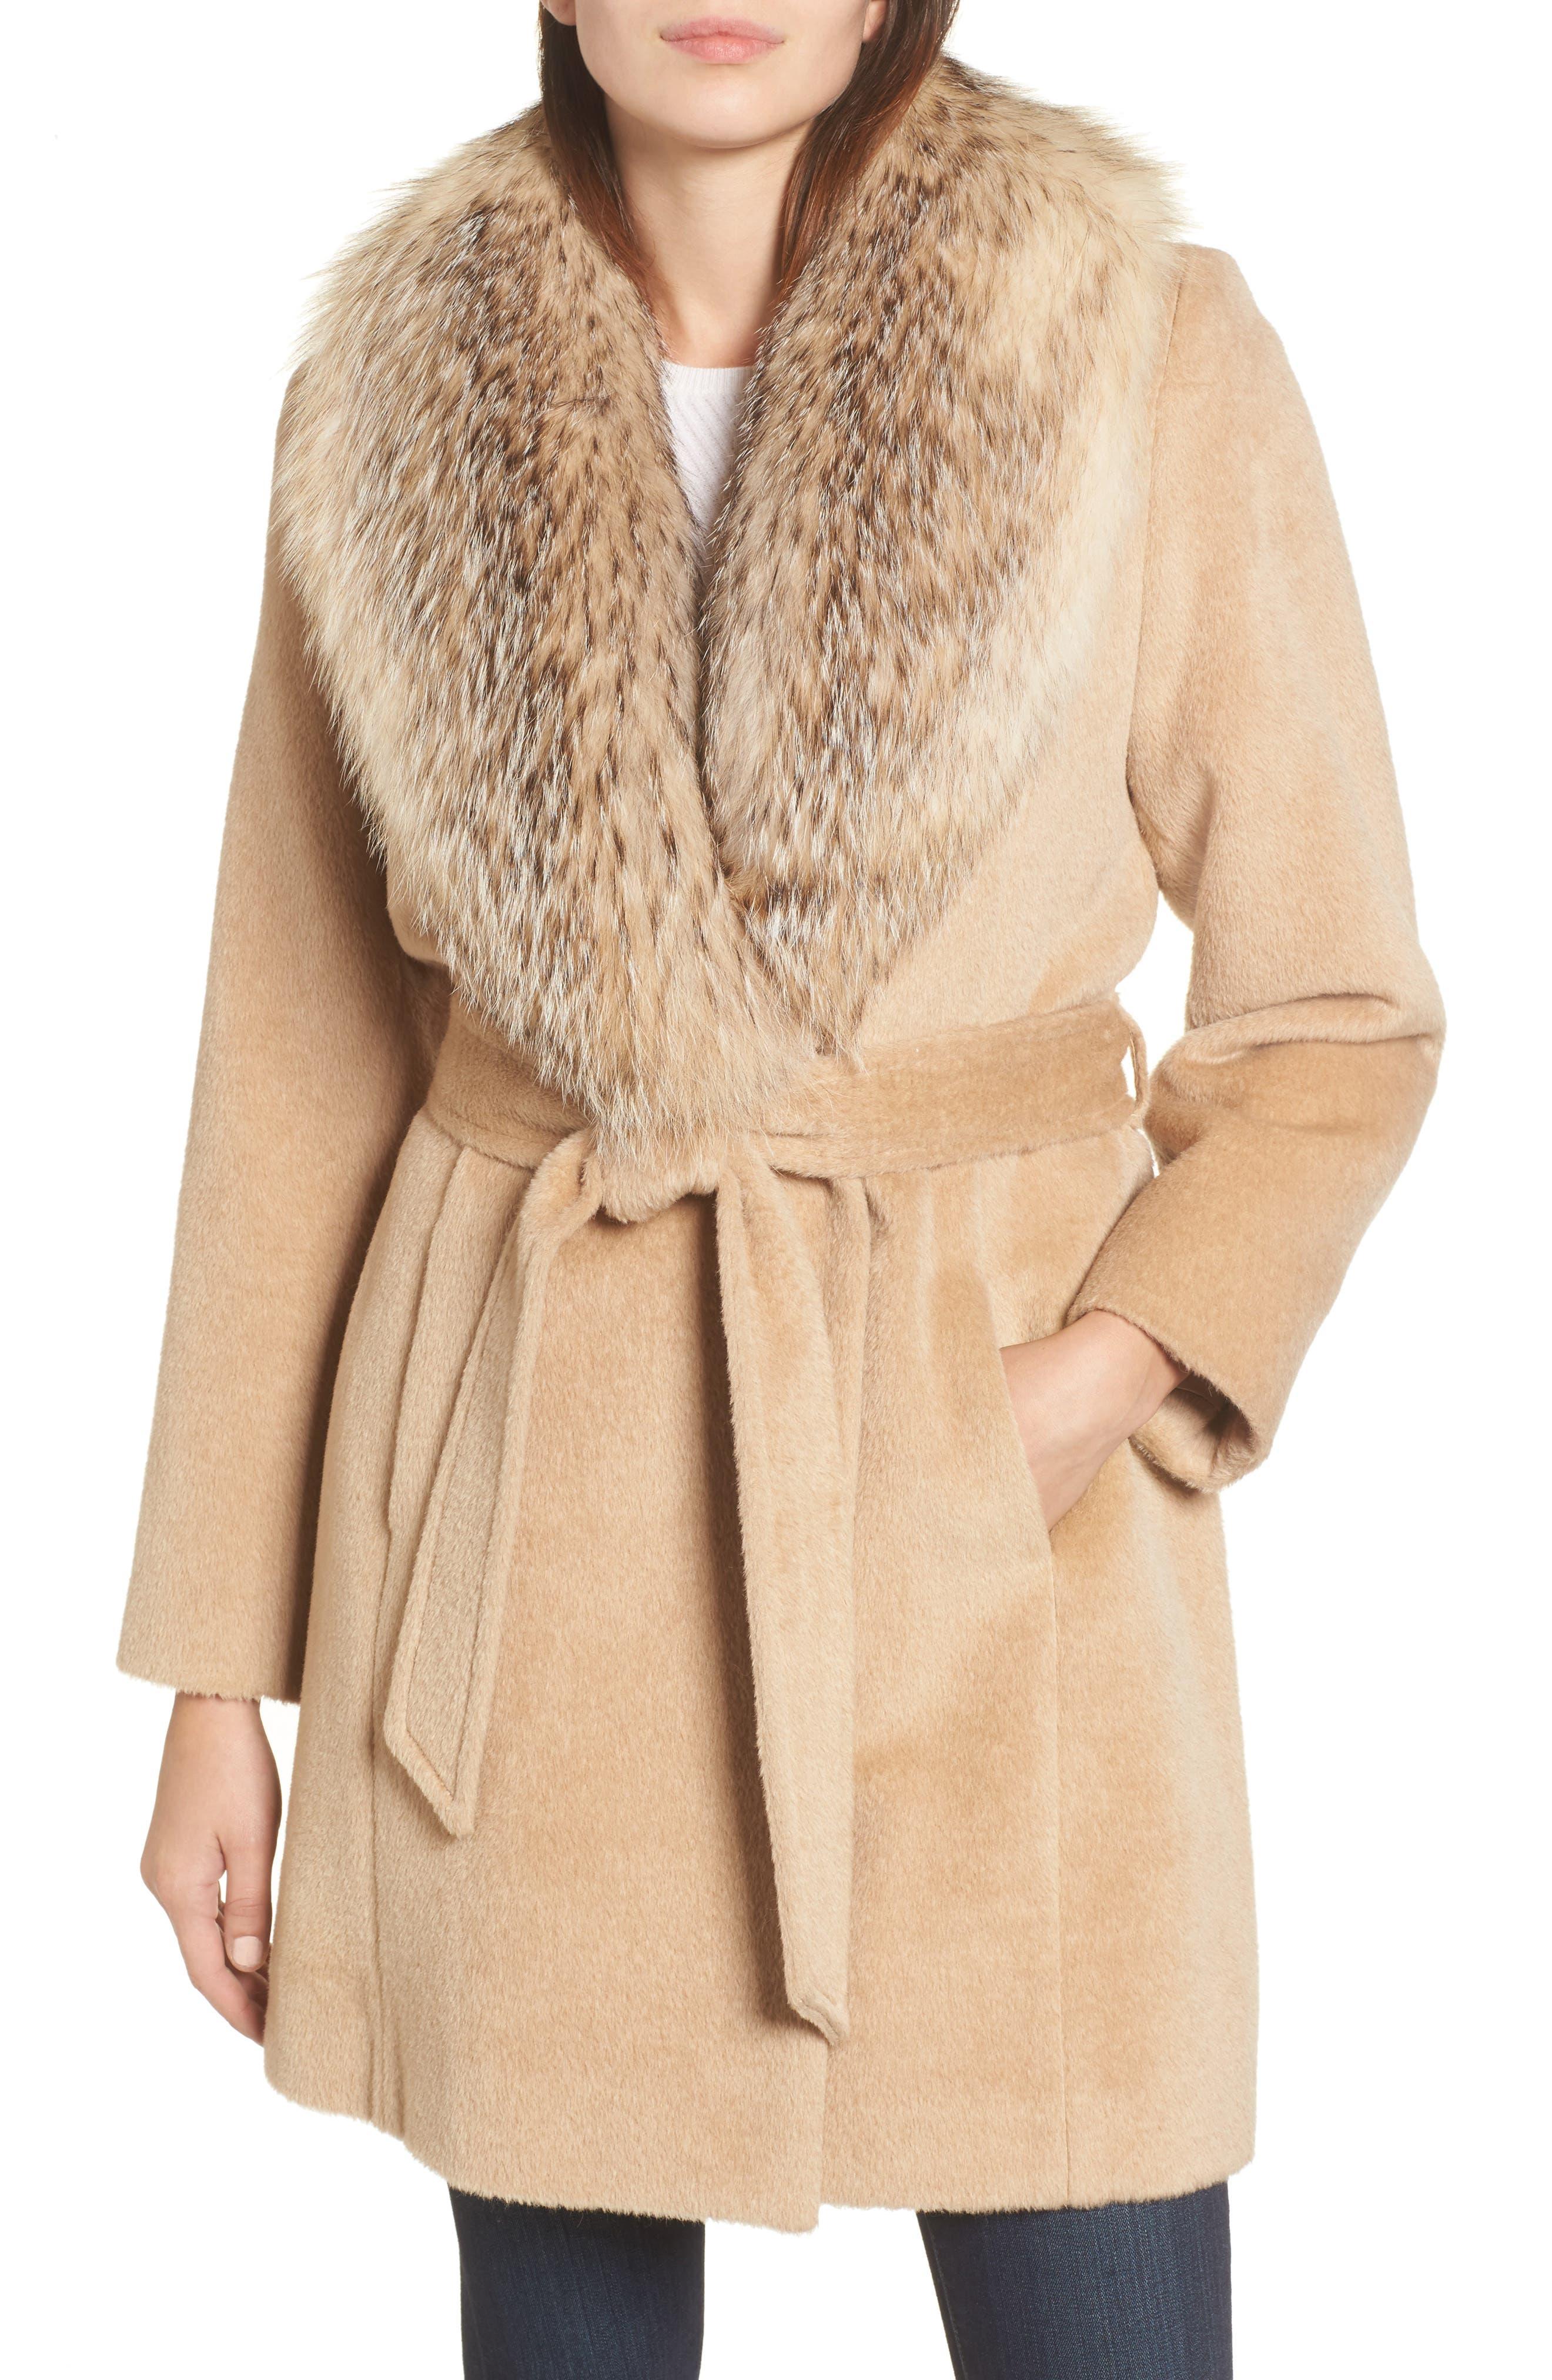 Sofia Cashmere Genuine Badger Fur Collar Wrap Coat